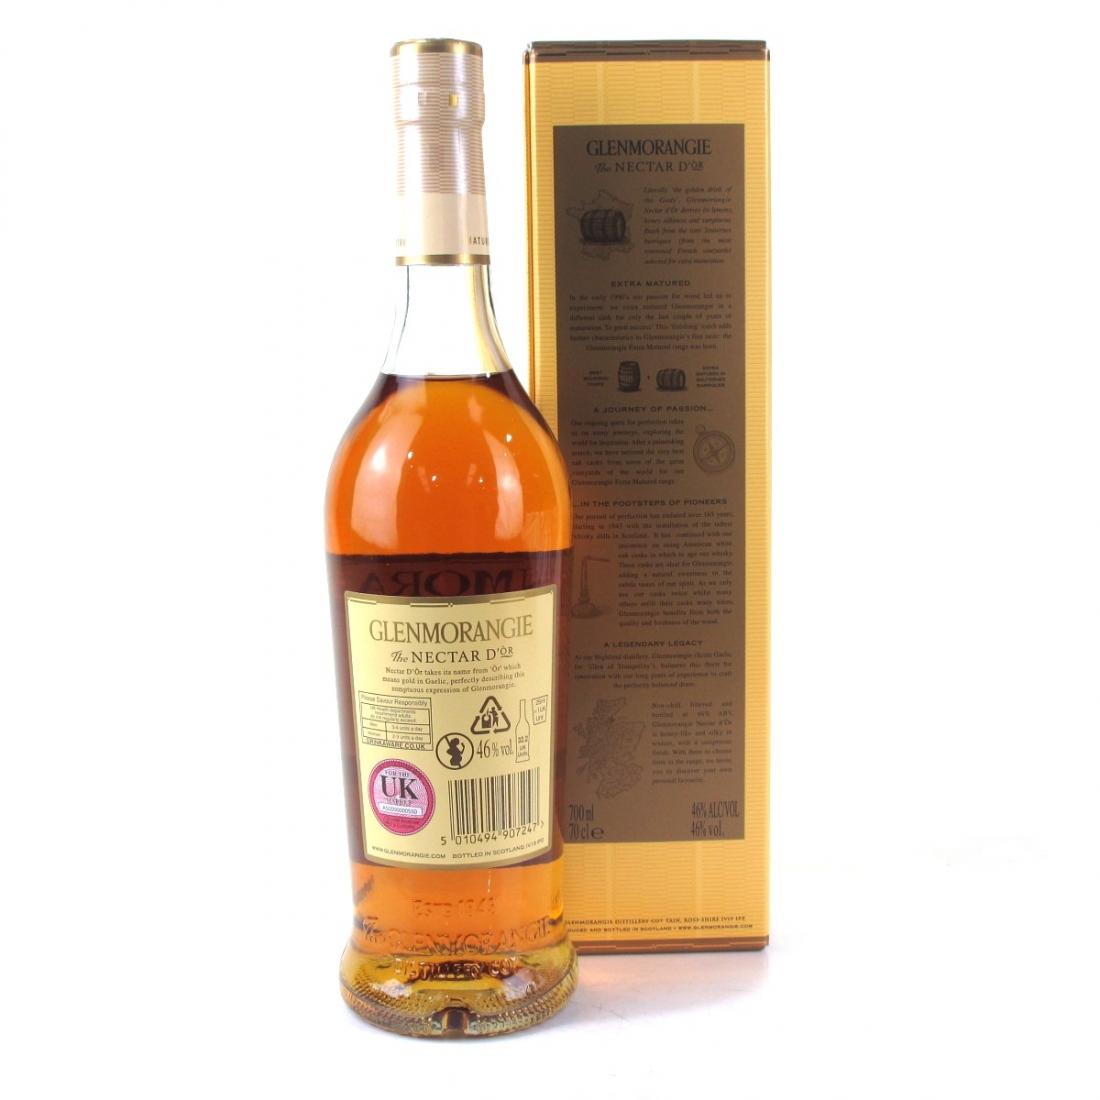 Glenmorangie Nectar D'Or 15 Year Old